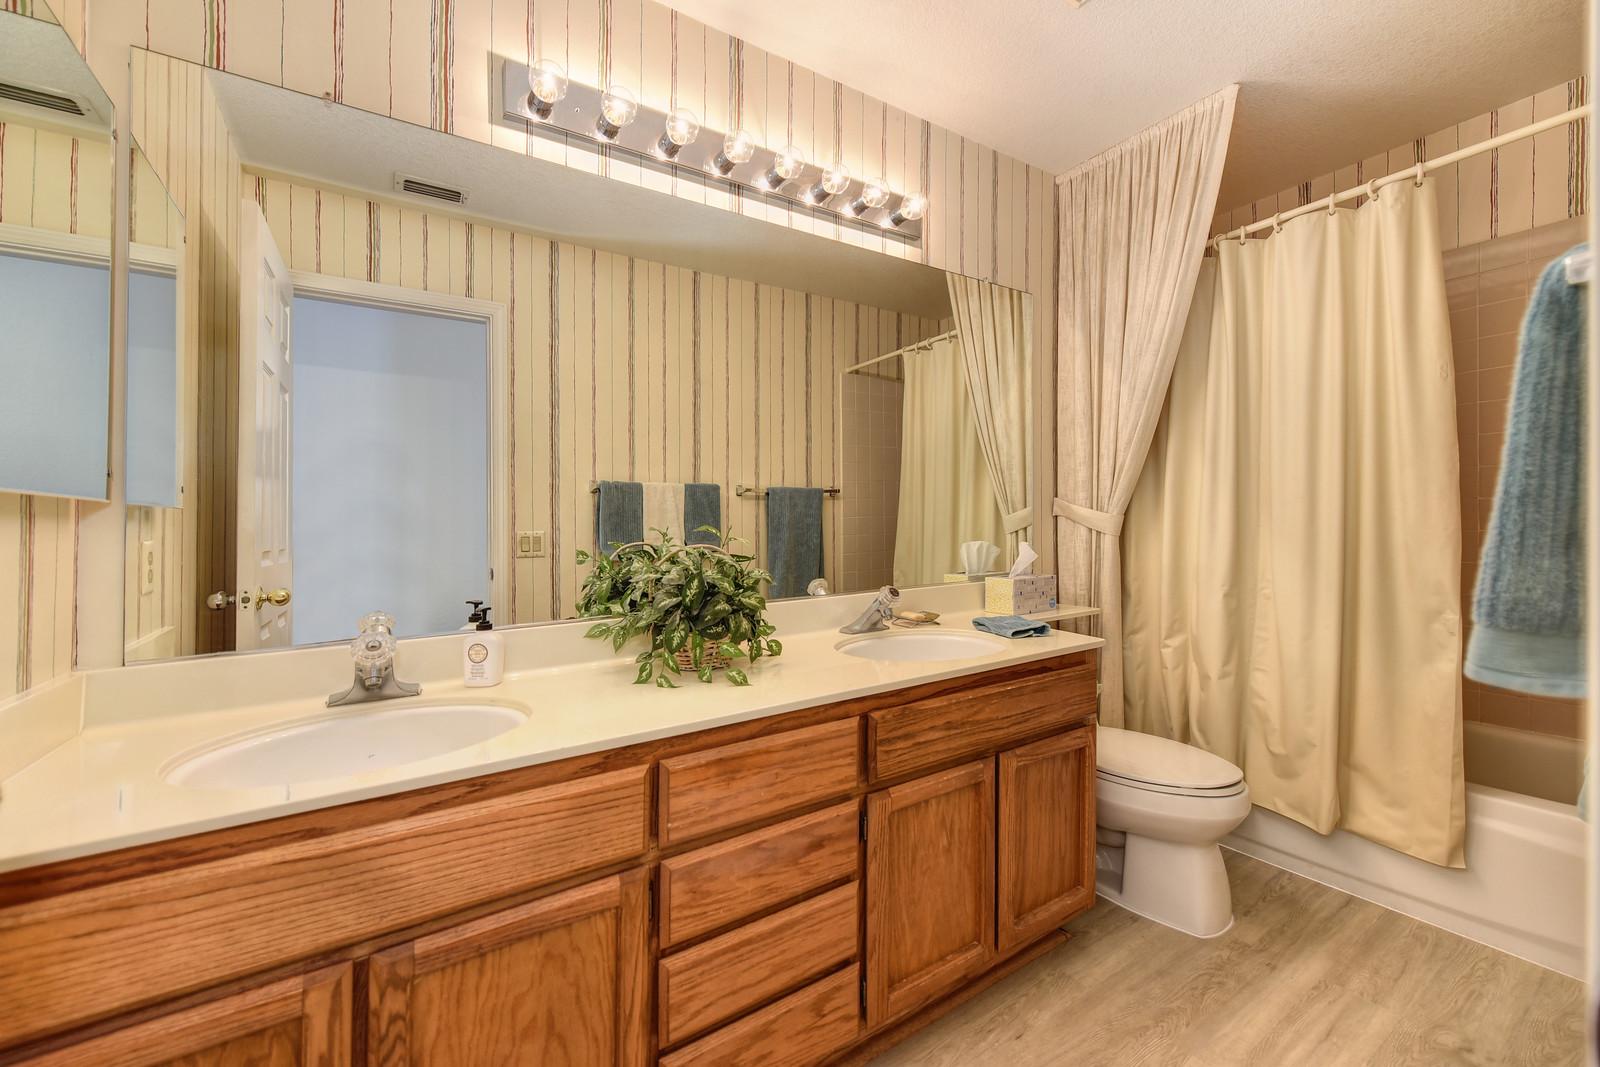 Realtor in Elk Grove California | Hall bathroom 9158 Old Creek Dr | Just sold